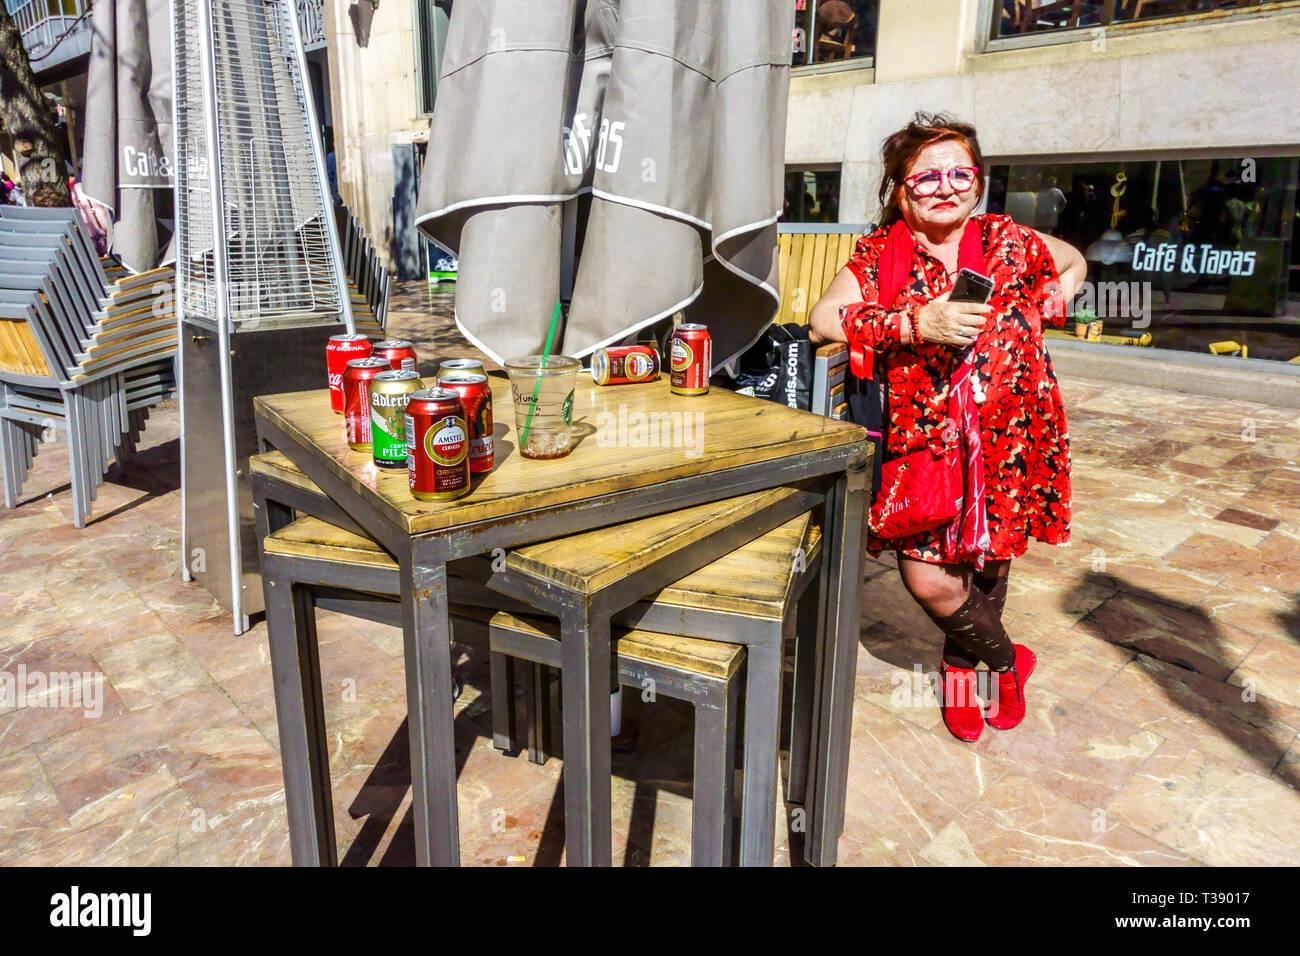 Porträt der Frau in Rot vor der Bar Cafe & Tapas, Plaça de l'Ajuntament, Rathausplatz, Valencia Spanien Europa Stockbild